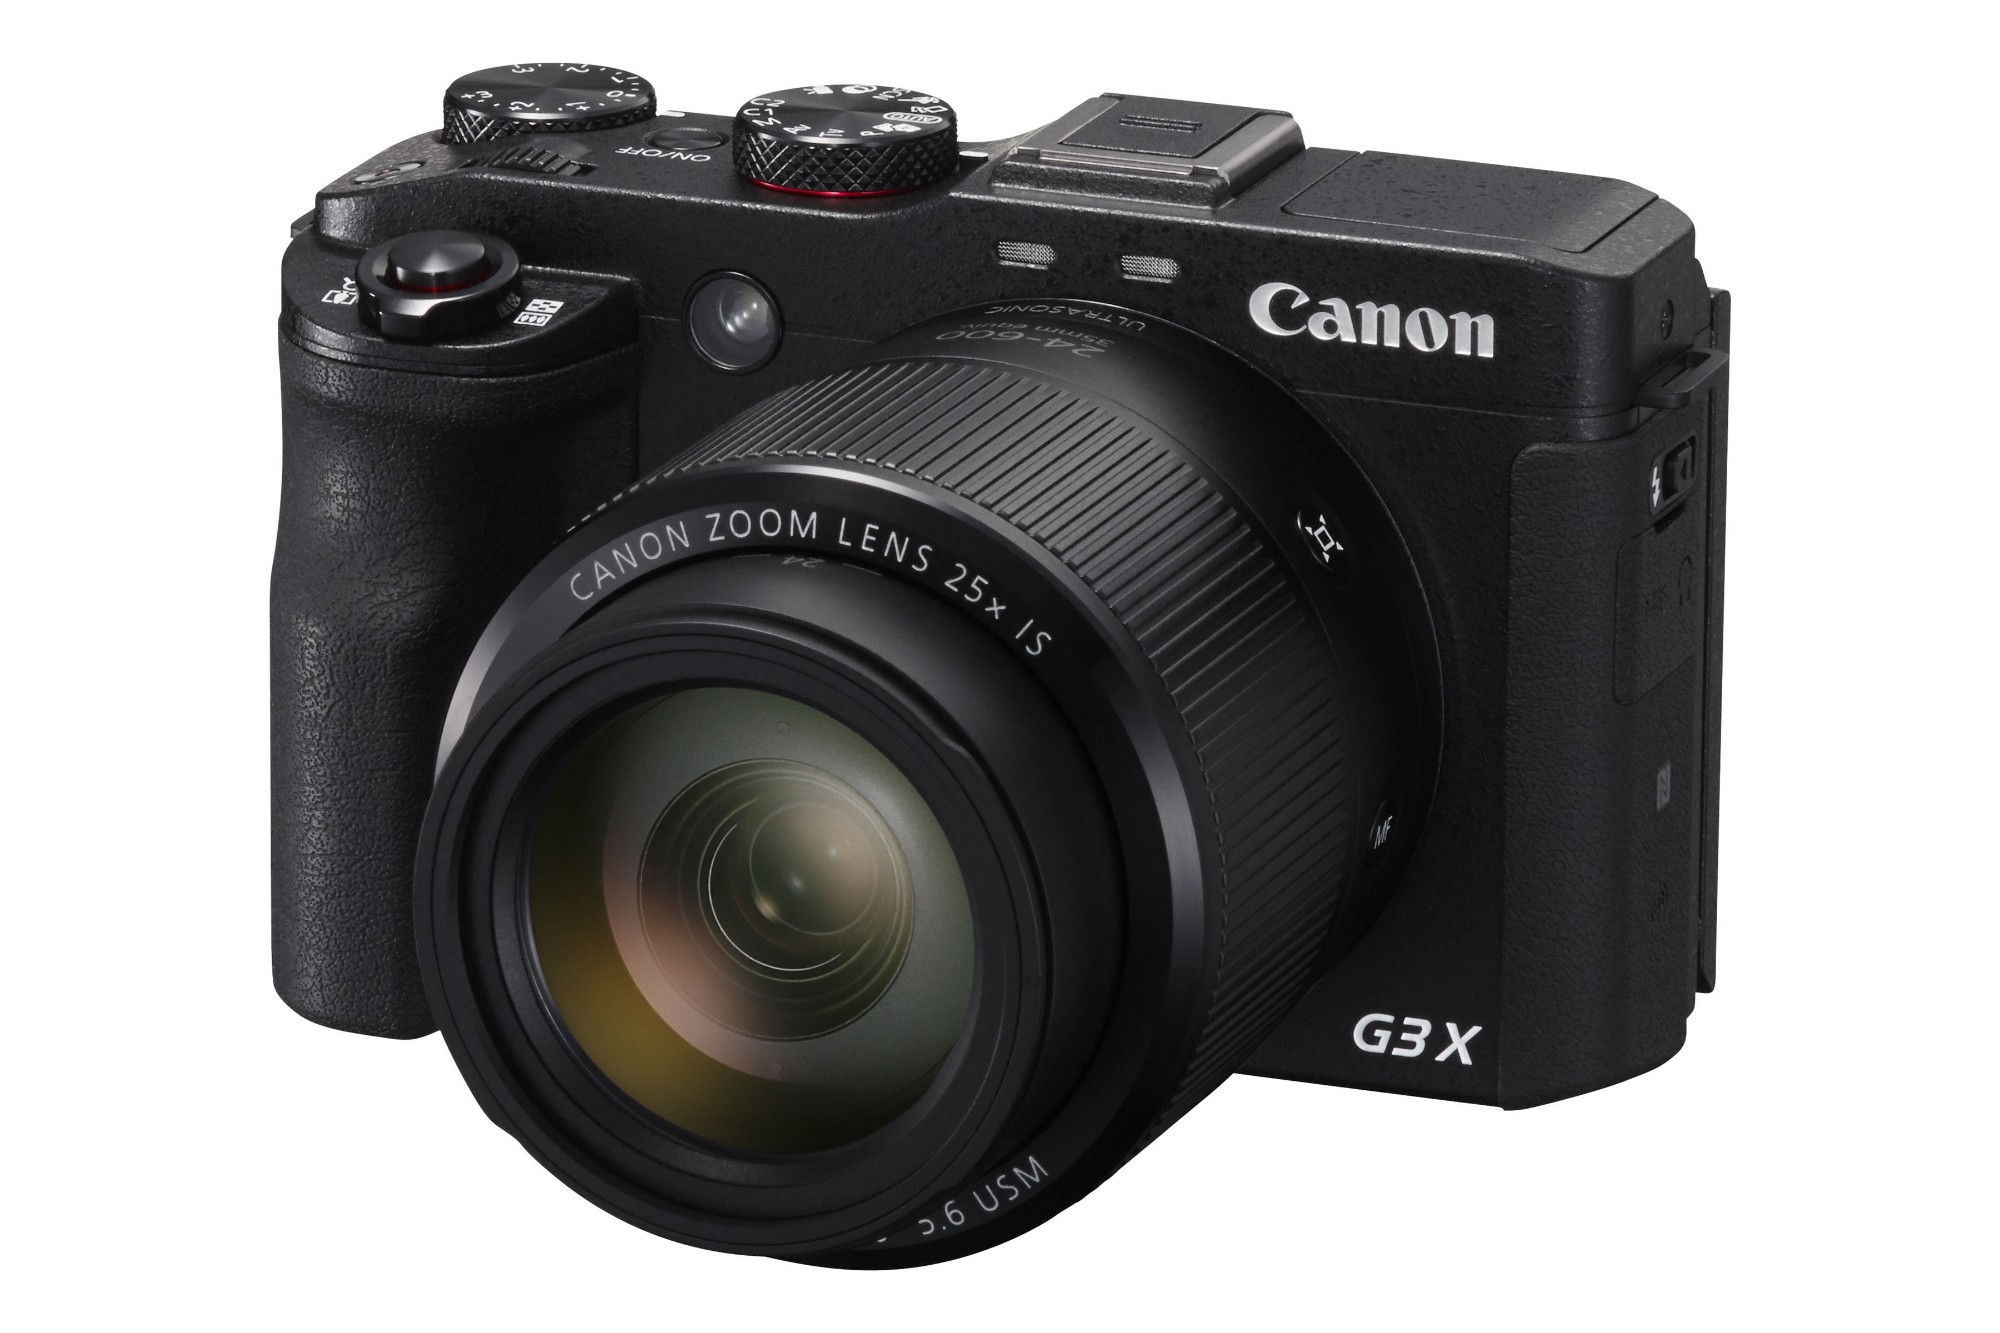 Canon Powershot G3X Camera Black